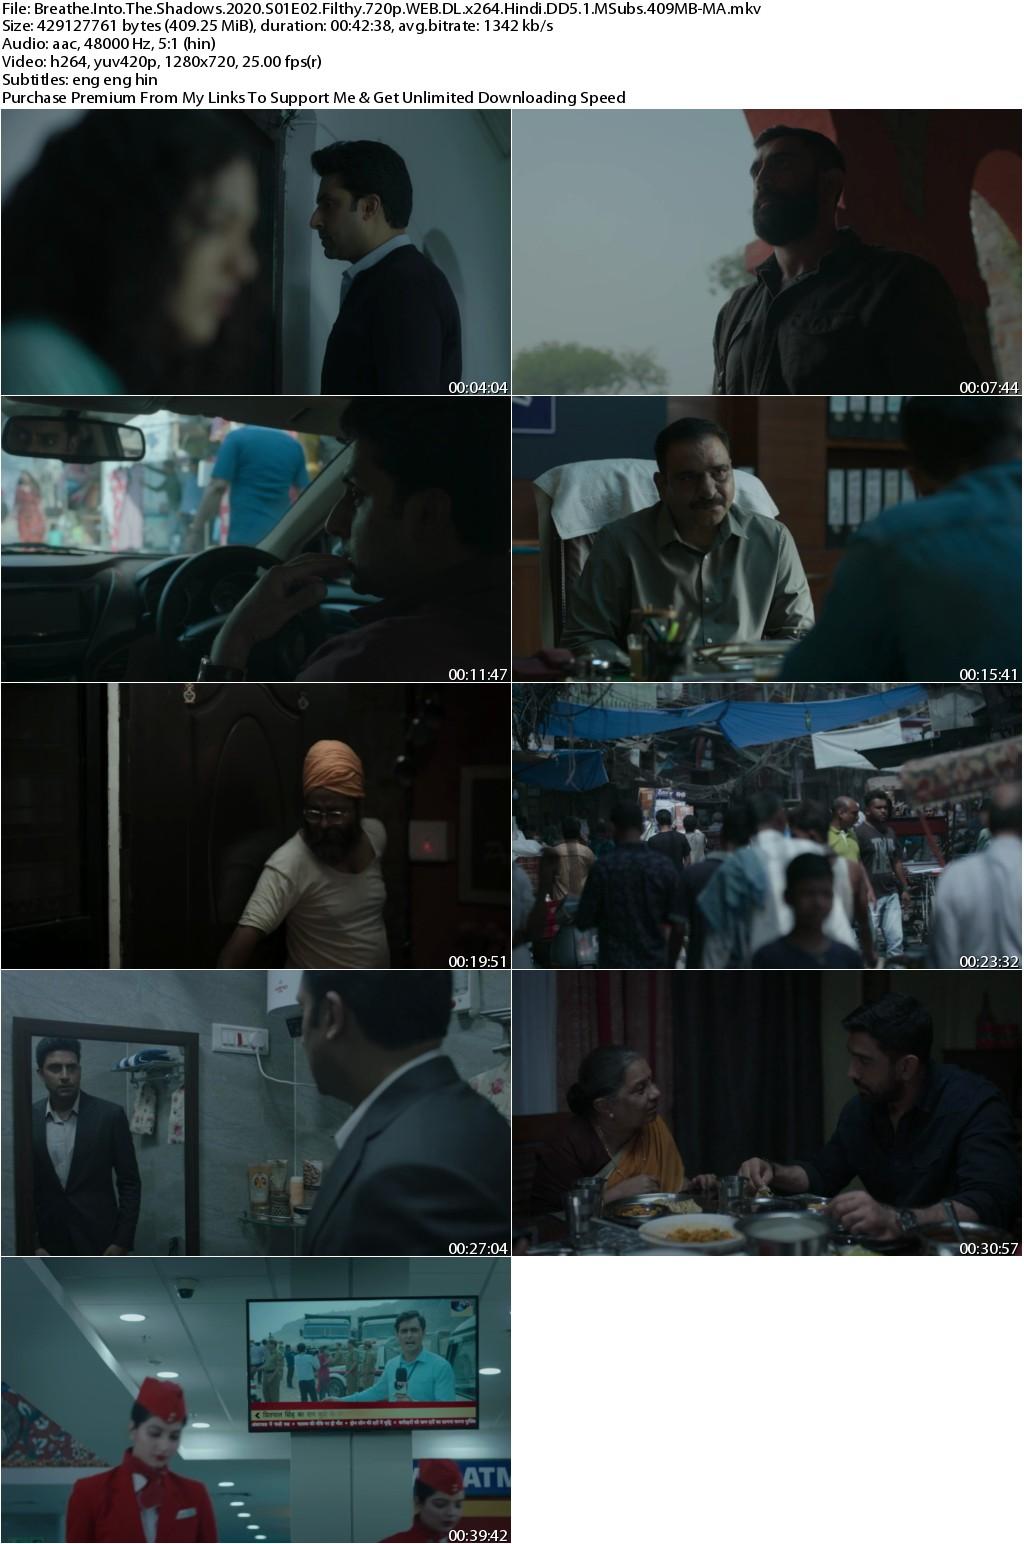 Breathe Into the Shadows 2020 Season 01 Complete 720p WEB-DL x264 Hindi DD5.1 MSubs-MA